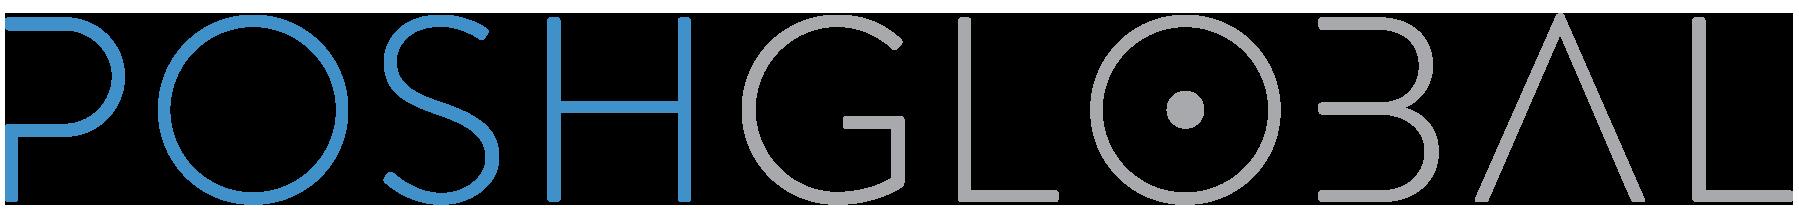 Das Logo der posh global GmbH